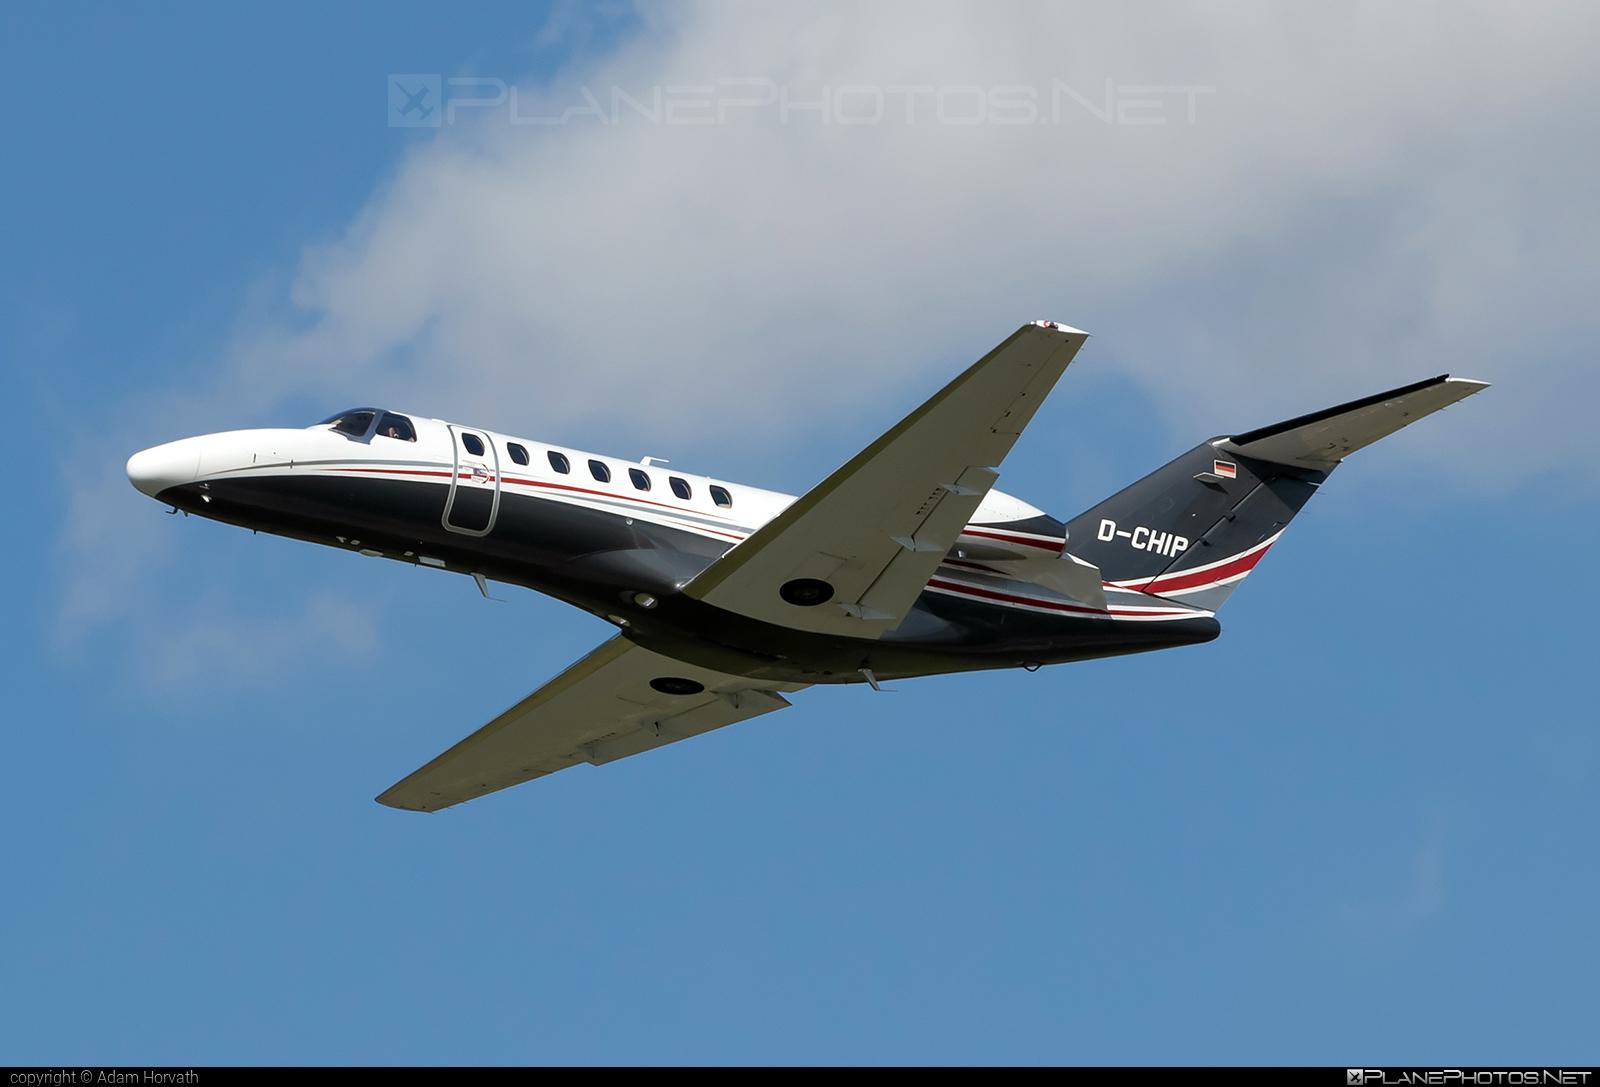 Cessna 525B Citation CJ3+ - D-CHIP operated by E-Aviation #cessna #cessna525 #cessna525b #cessnacitation #citationjet #citationjet3 #citationjet3plus #cj3 #cj3plus #eaviation